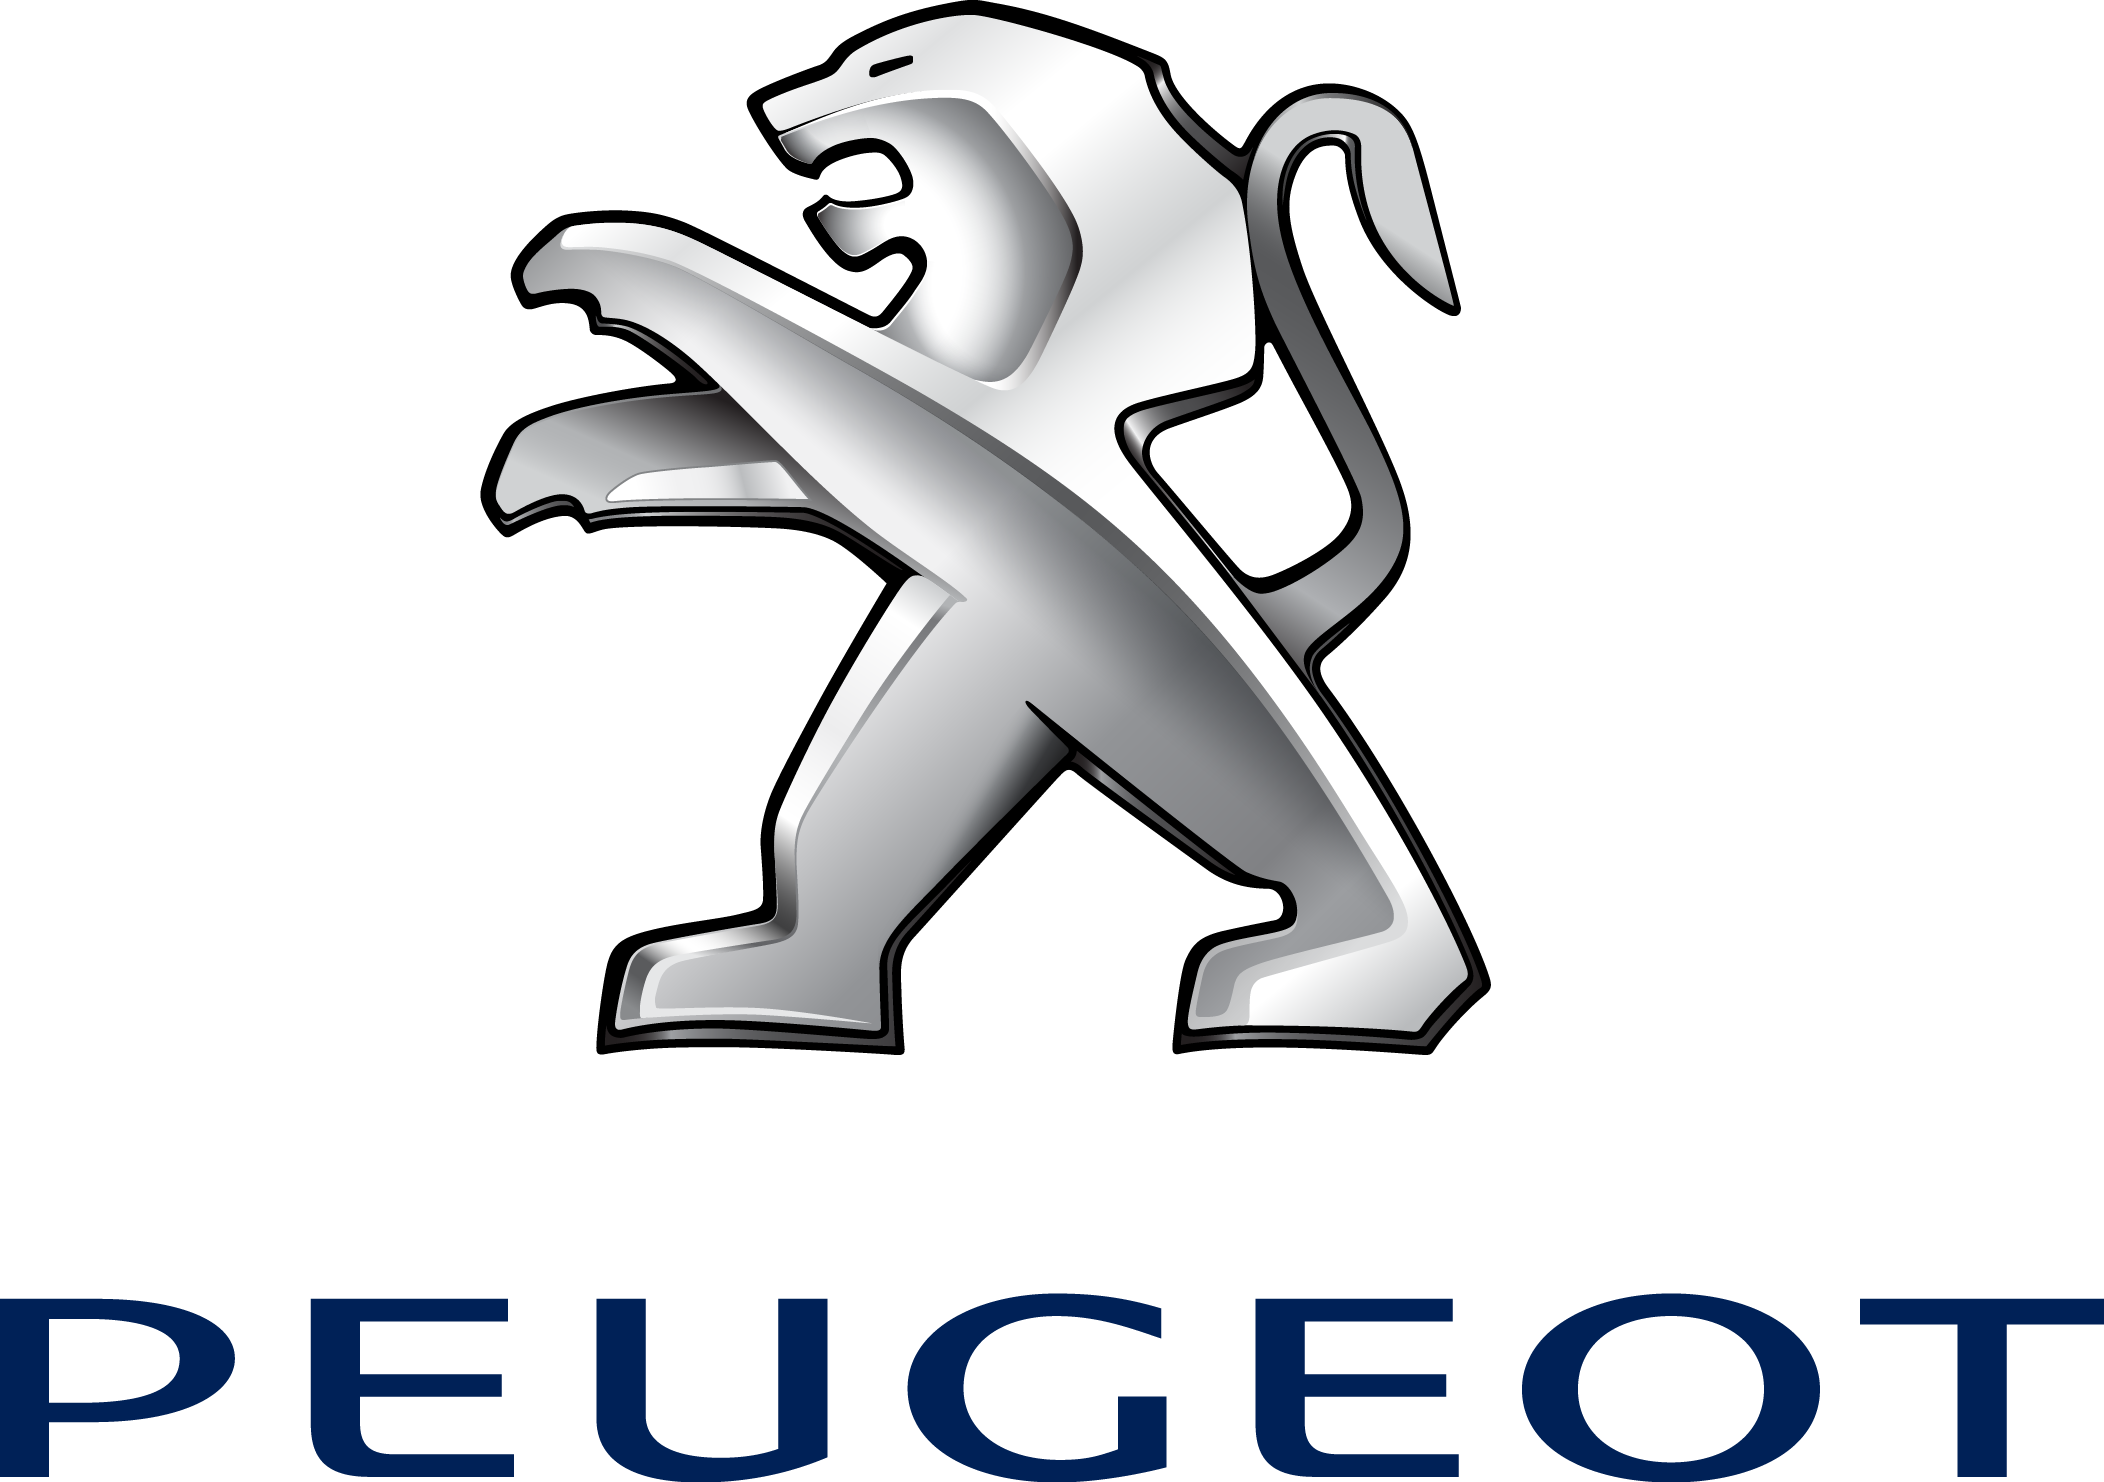 peugeot_logo - Peugeot Logo PNG